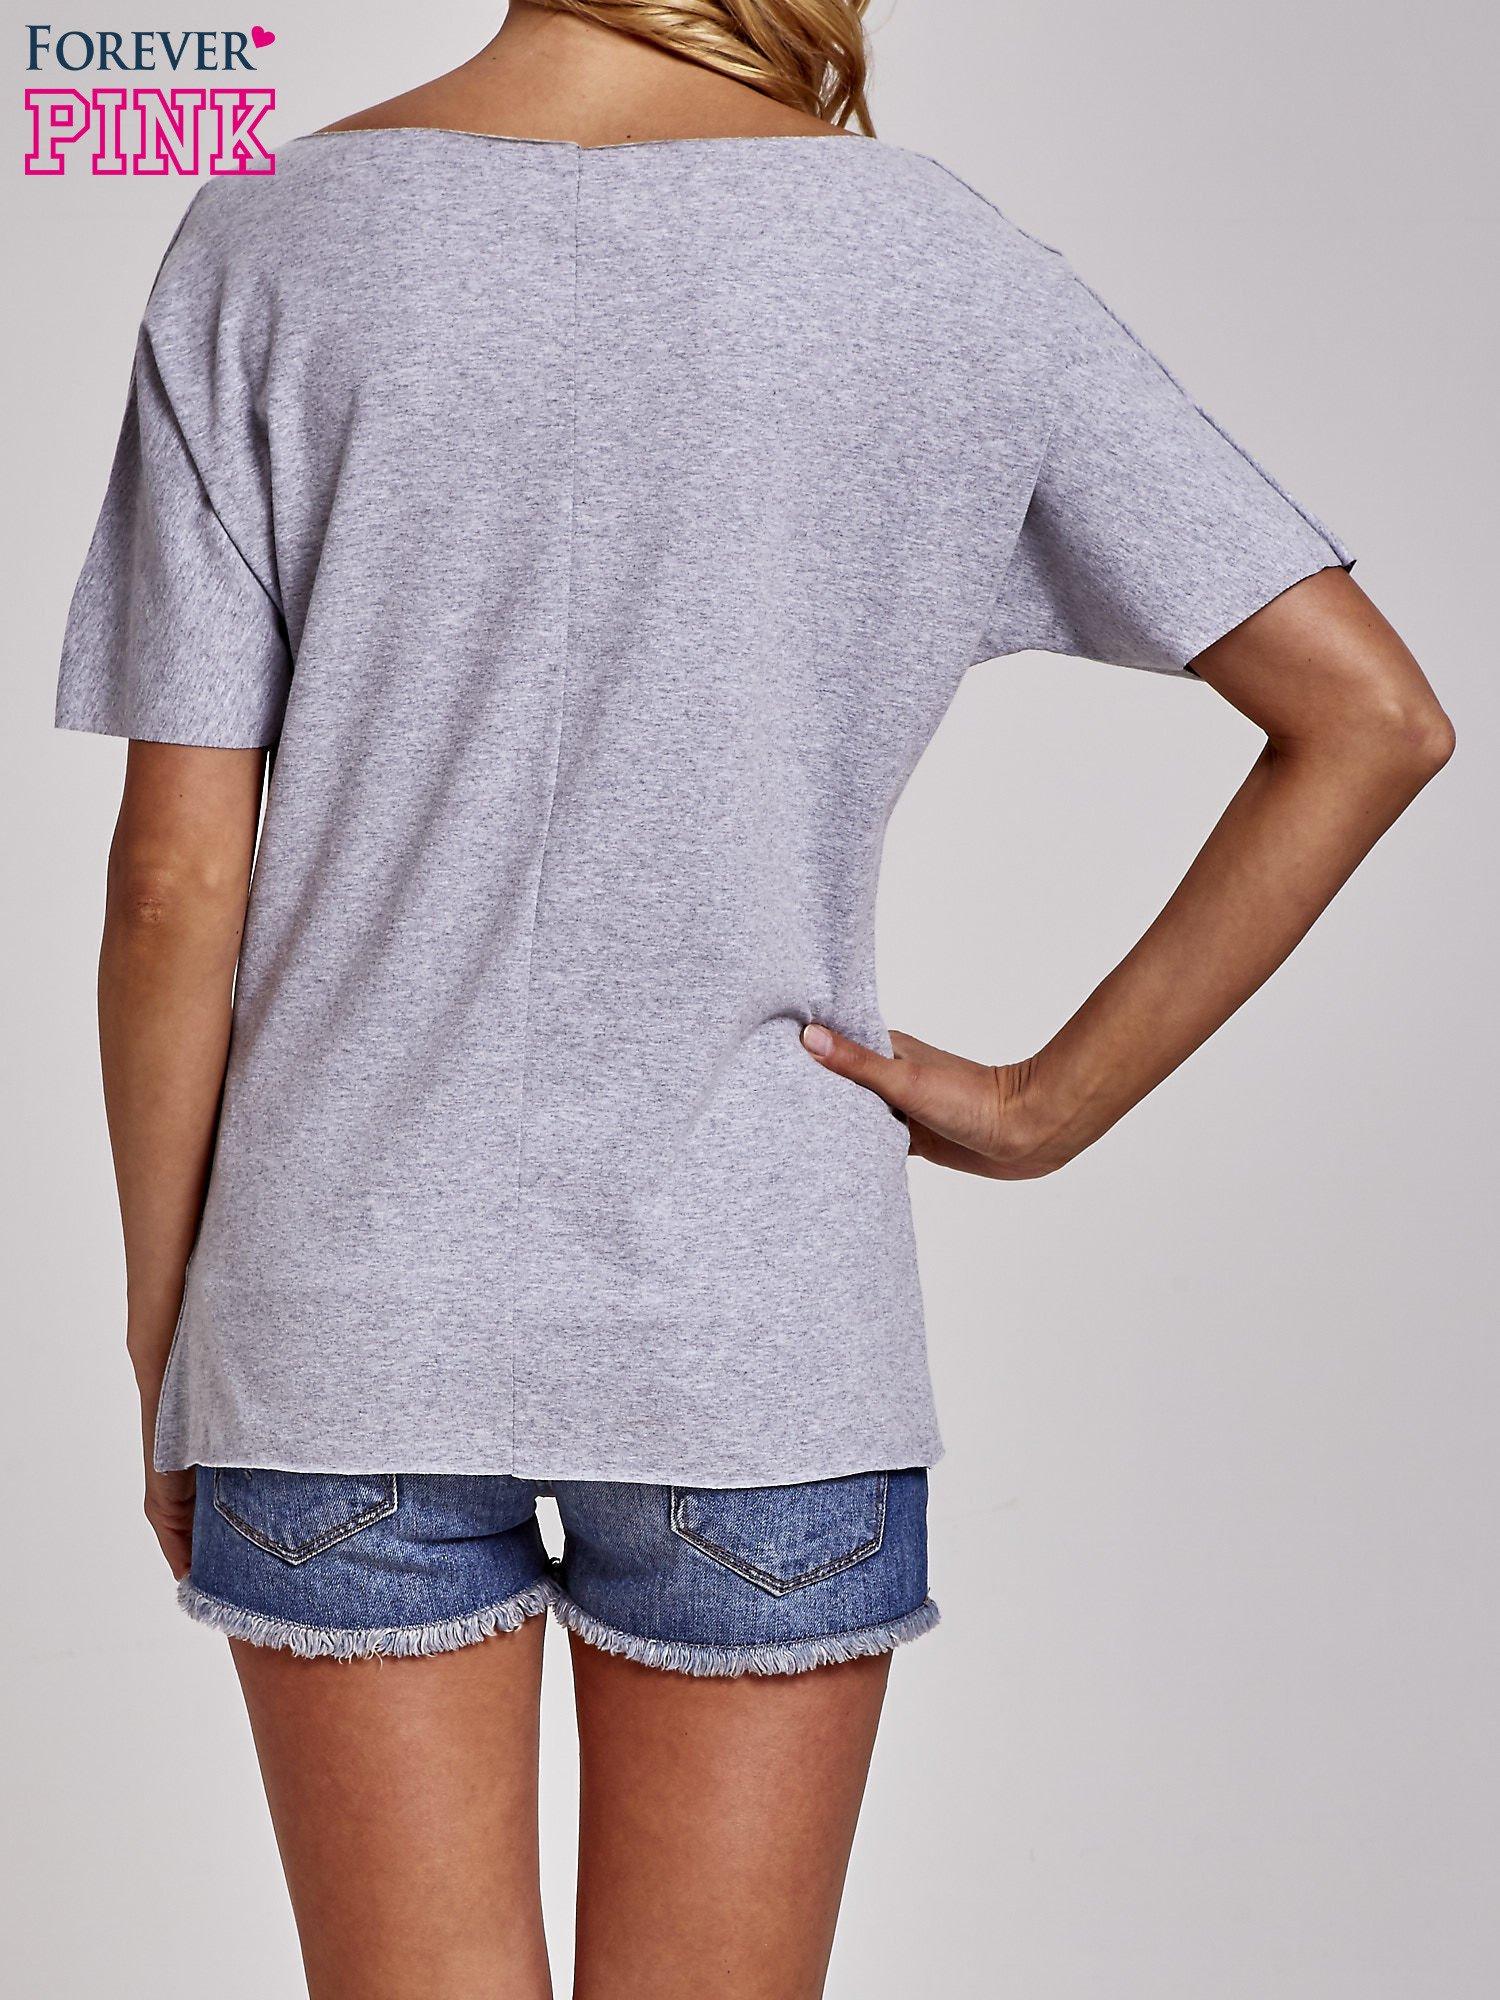 Szary t-shirt z motywem serce i krzyżyk                                  zdj.                                  4